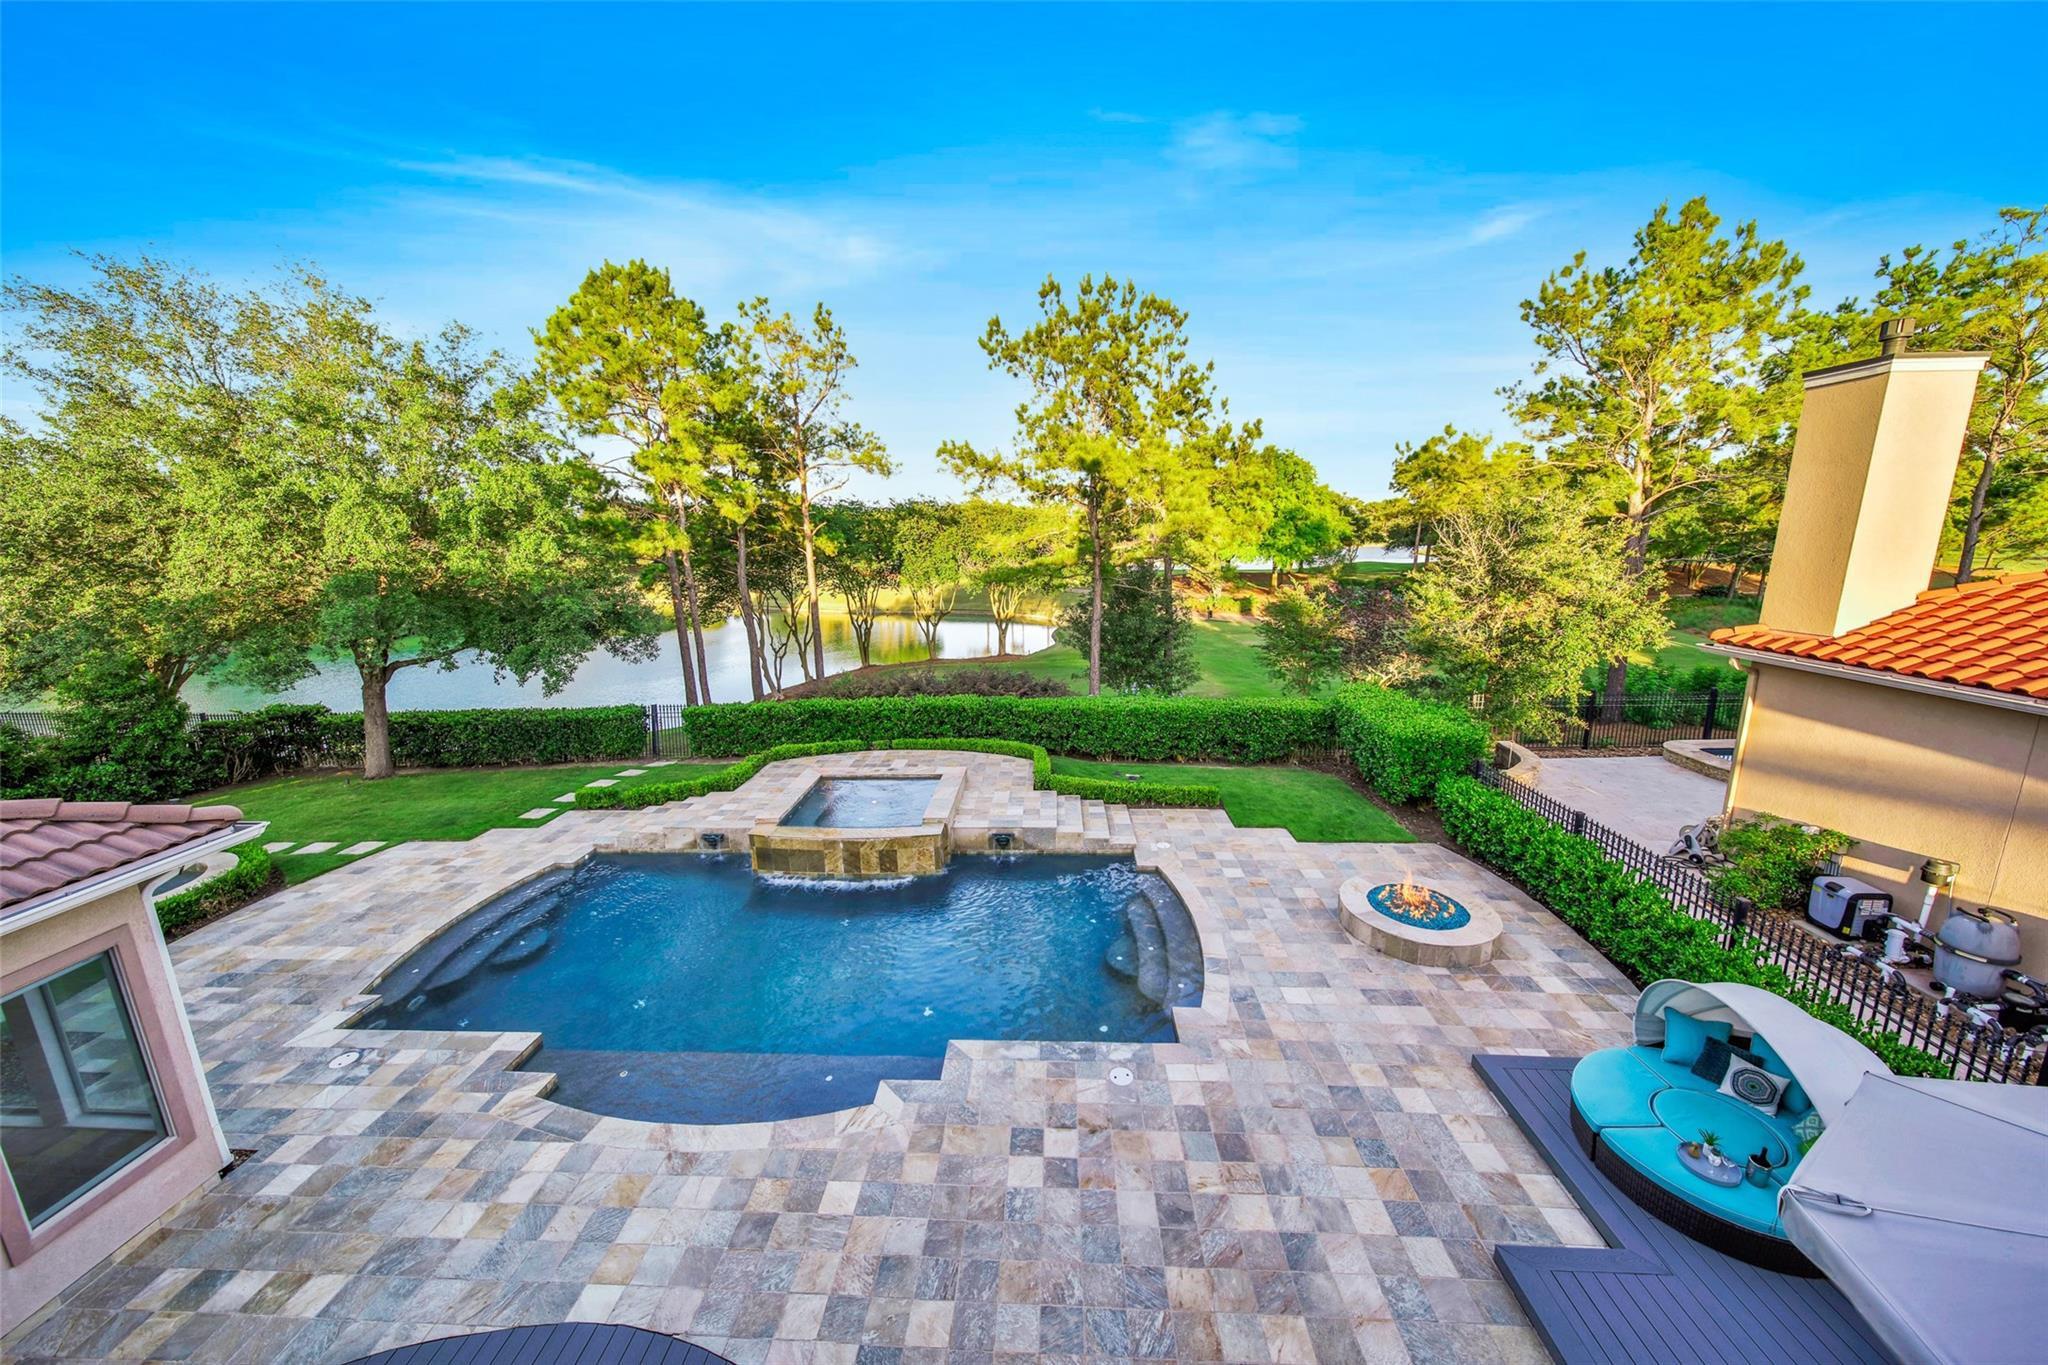 3019 Rosemary Park Lane Property Photo - Houston, TX real estate listing